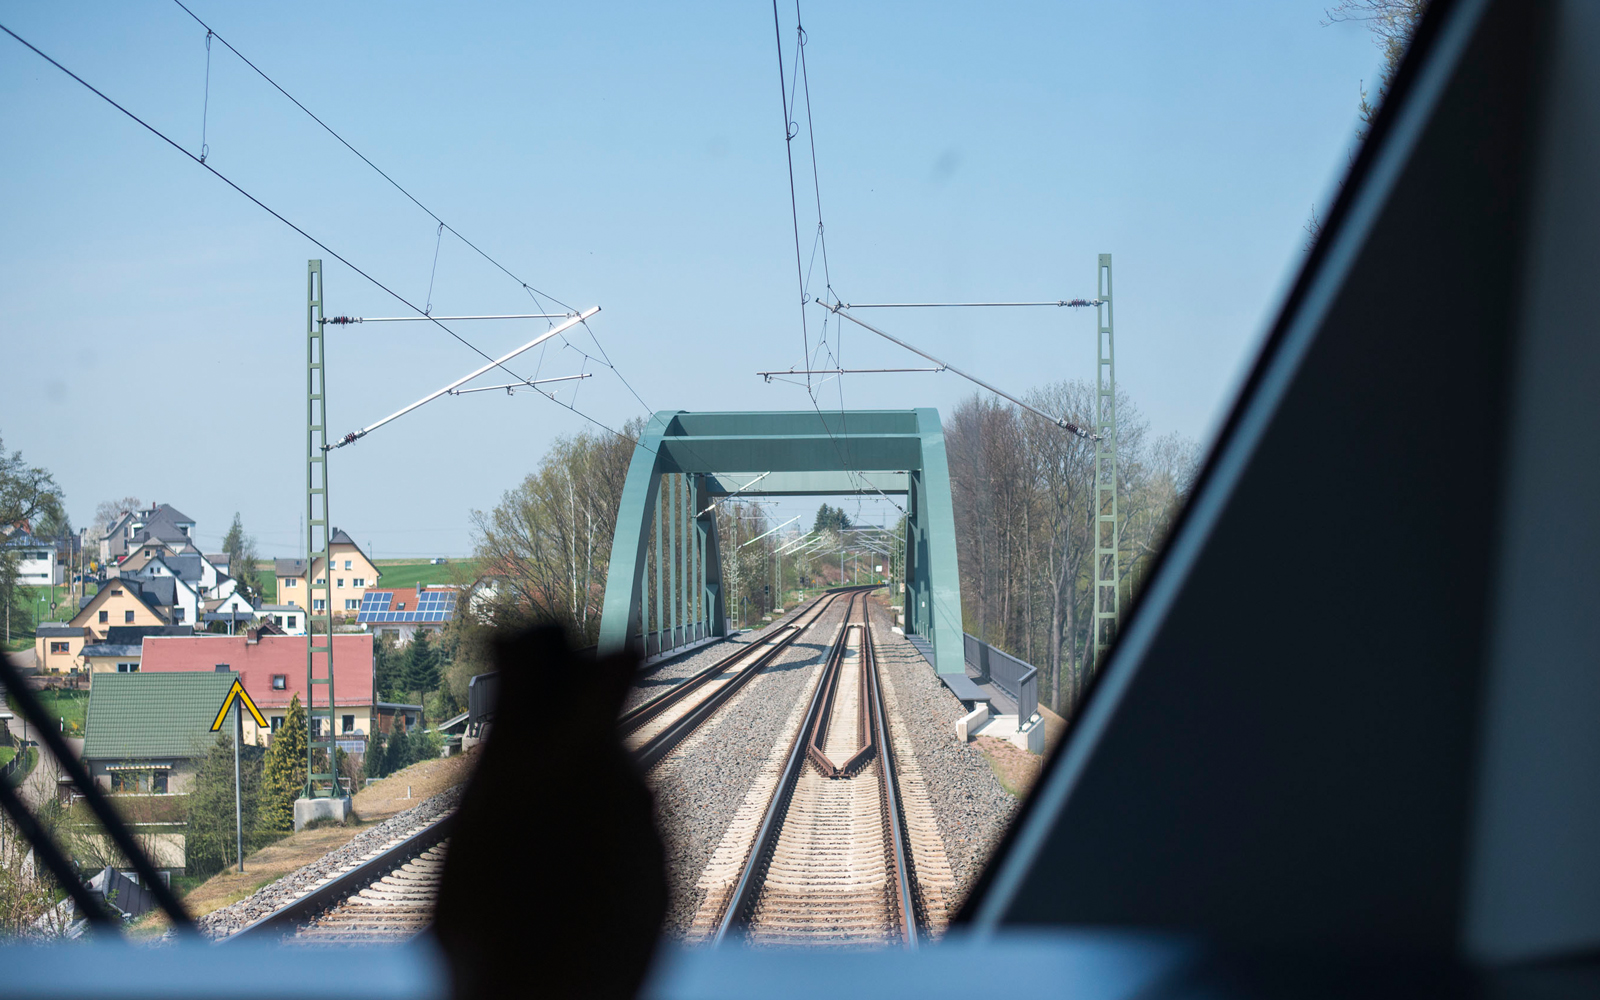 © Foto: Susann Wentzlaff | MRB Linie RB 30